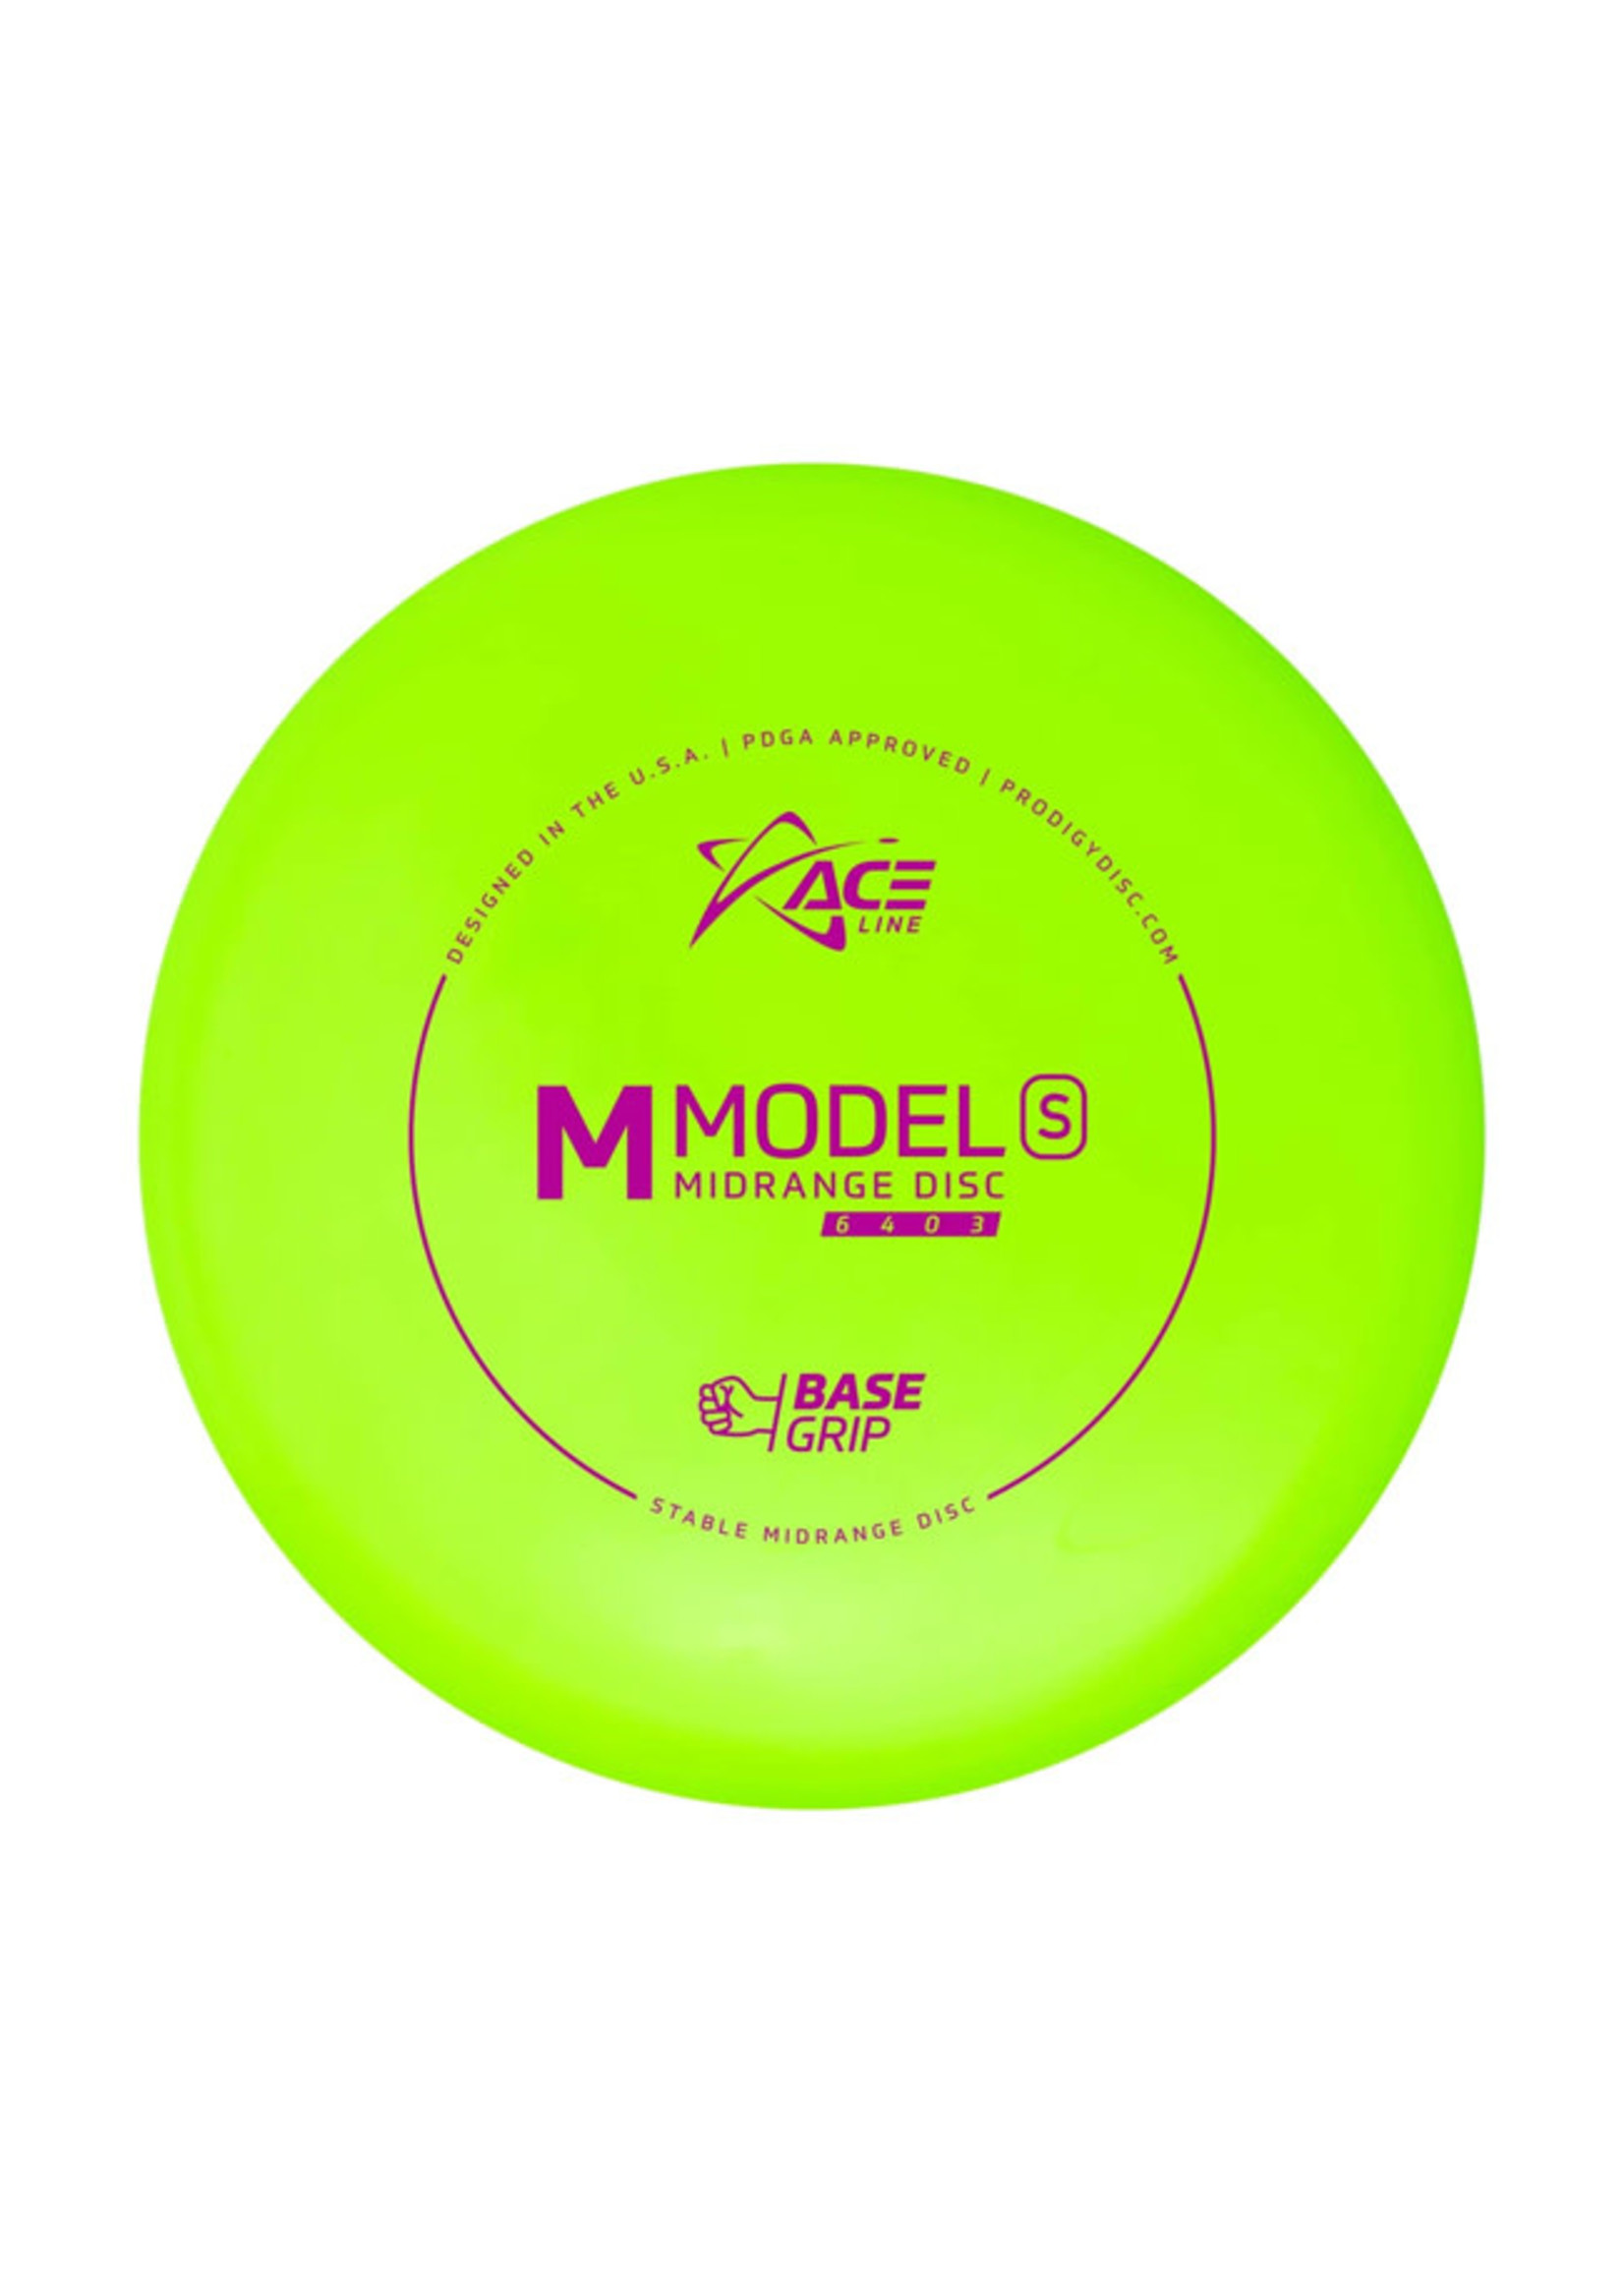 Prodigy Prodigy Ace M Model S Midrange Disc